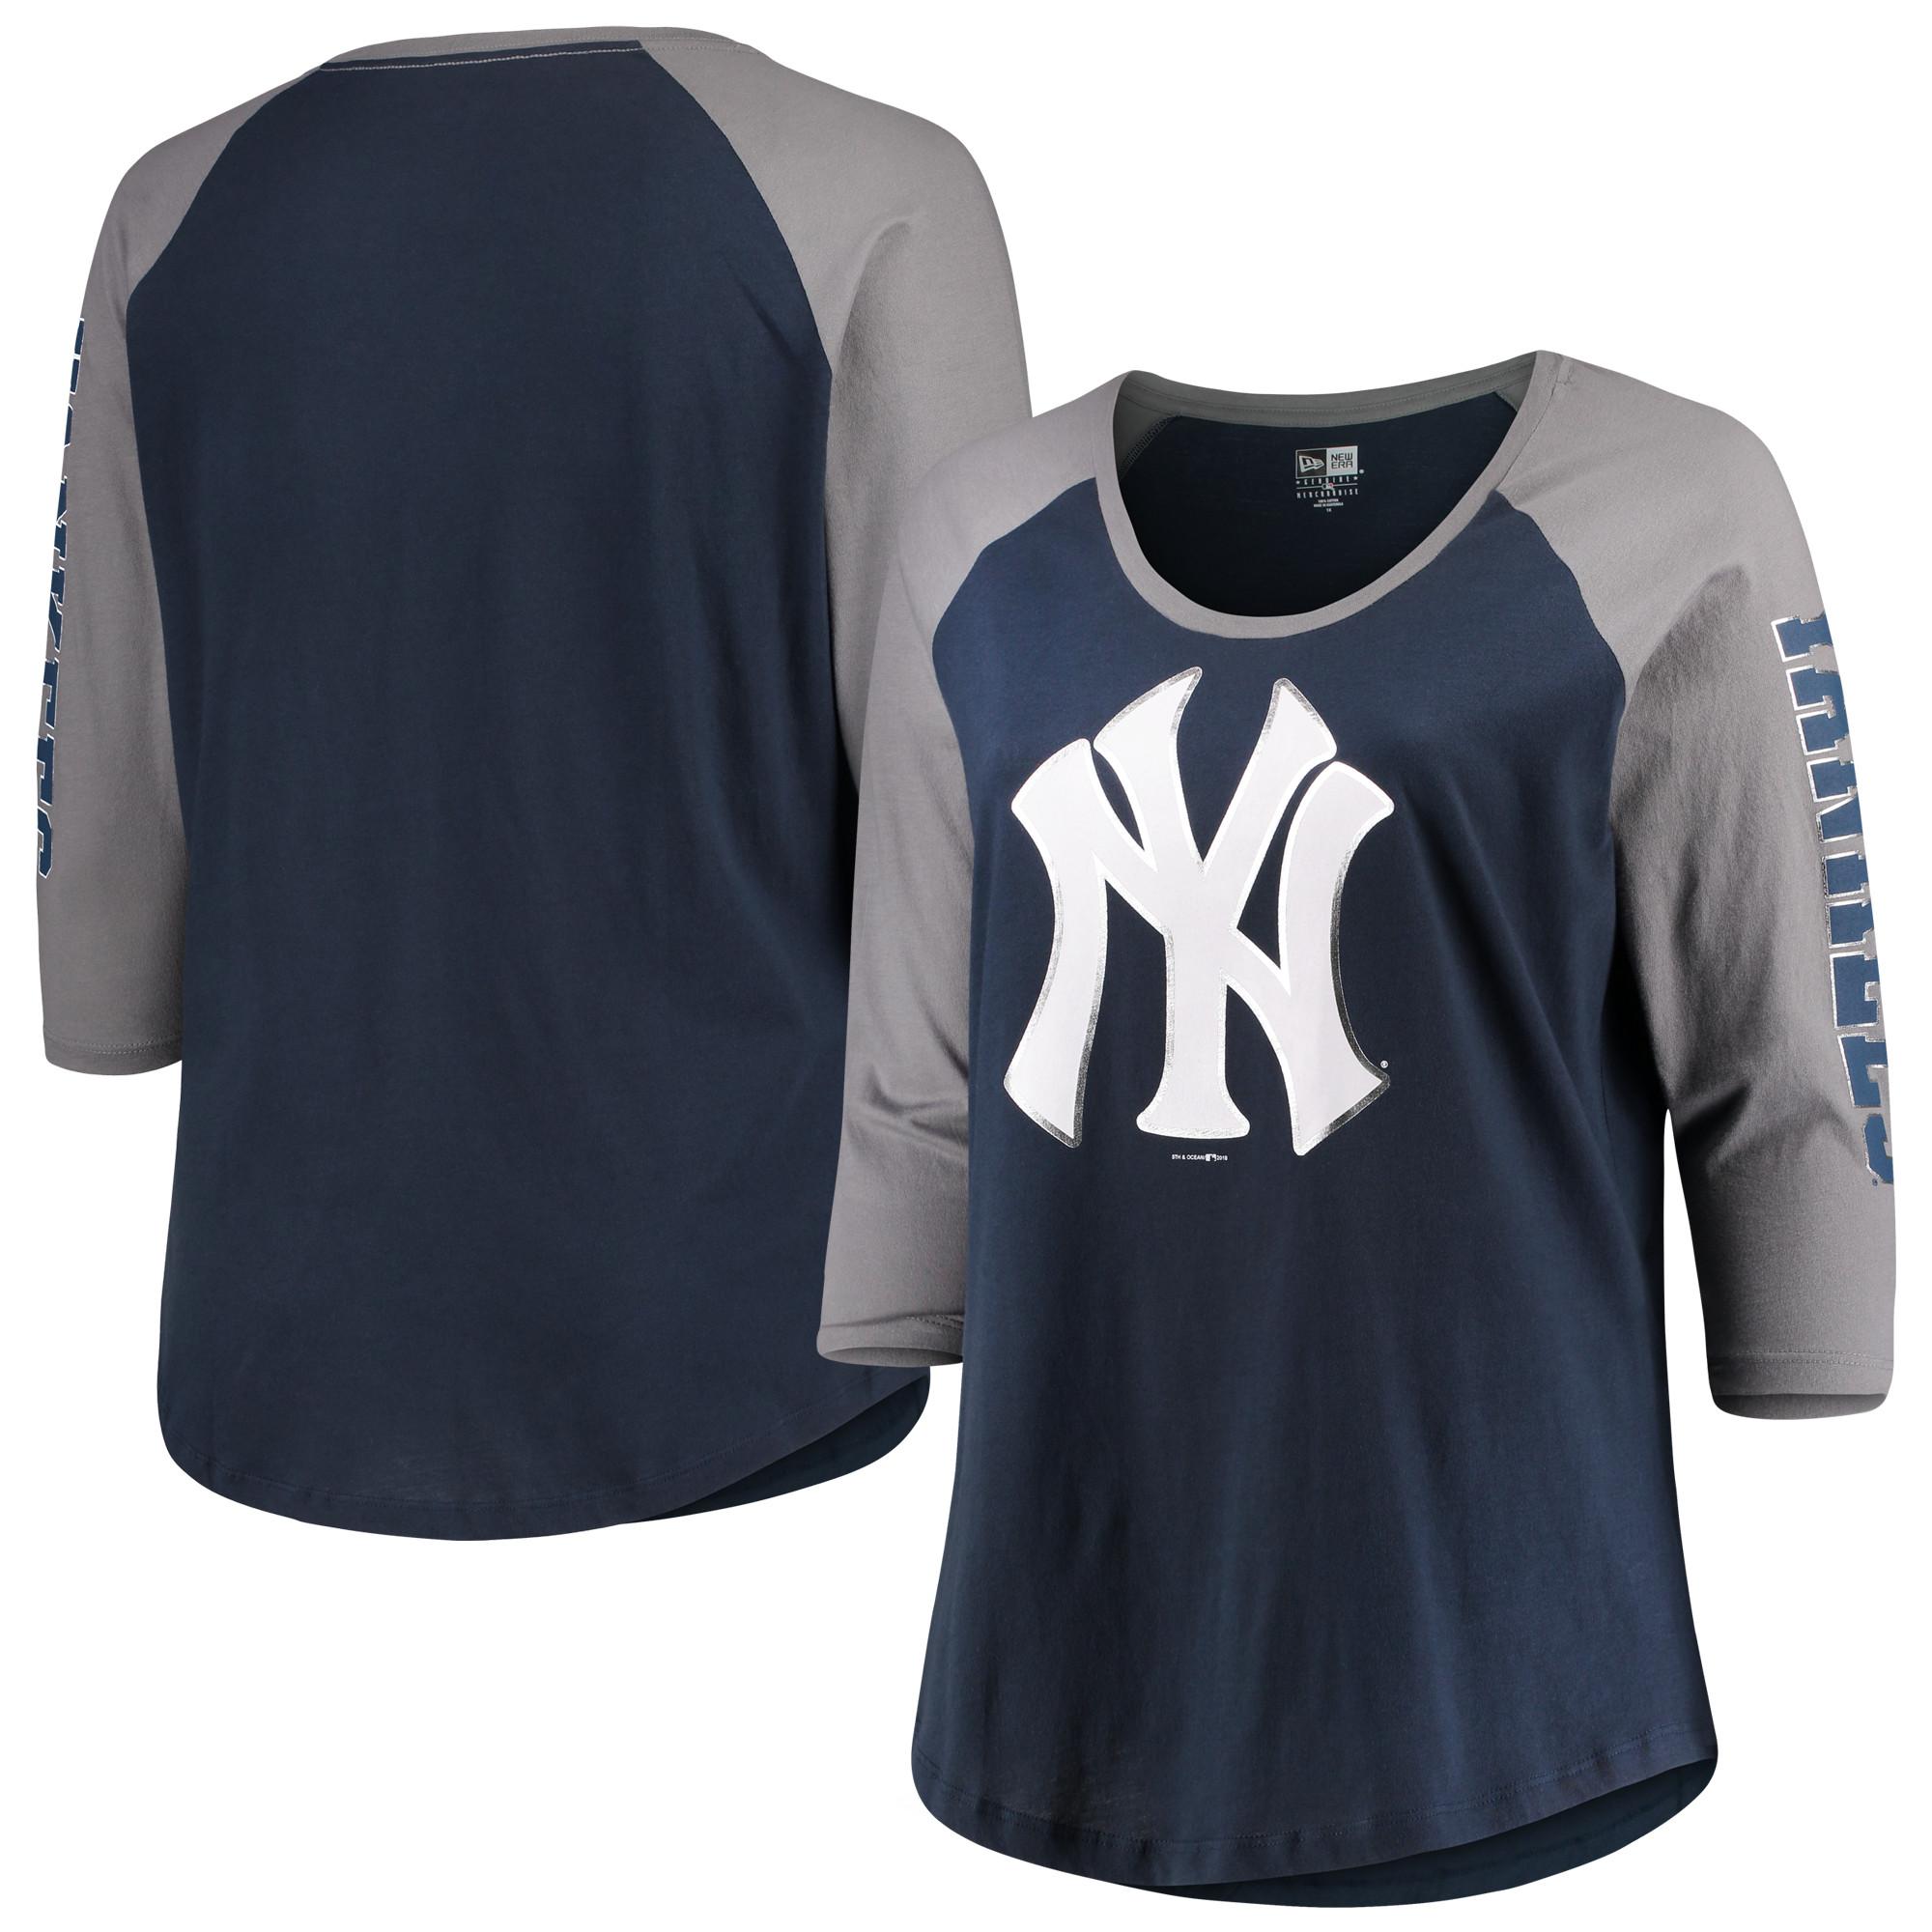 New York Yankees 5th & Ocean by New Era Women's Plus Size Foil 3/4-Sleeve Scoop Neck T-Shirt - Navy/Gray